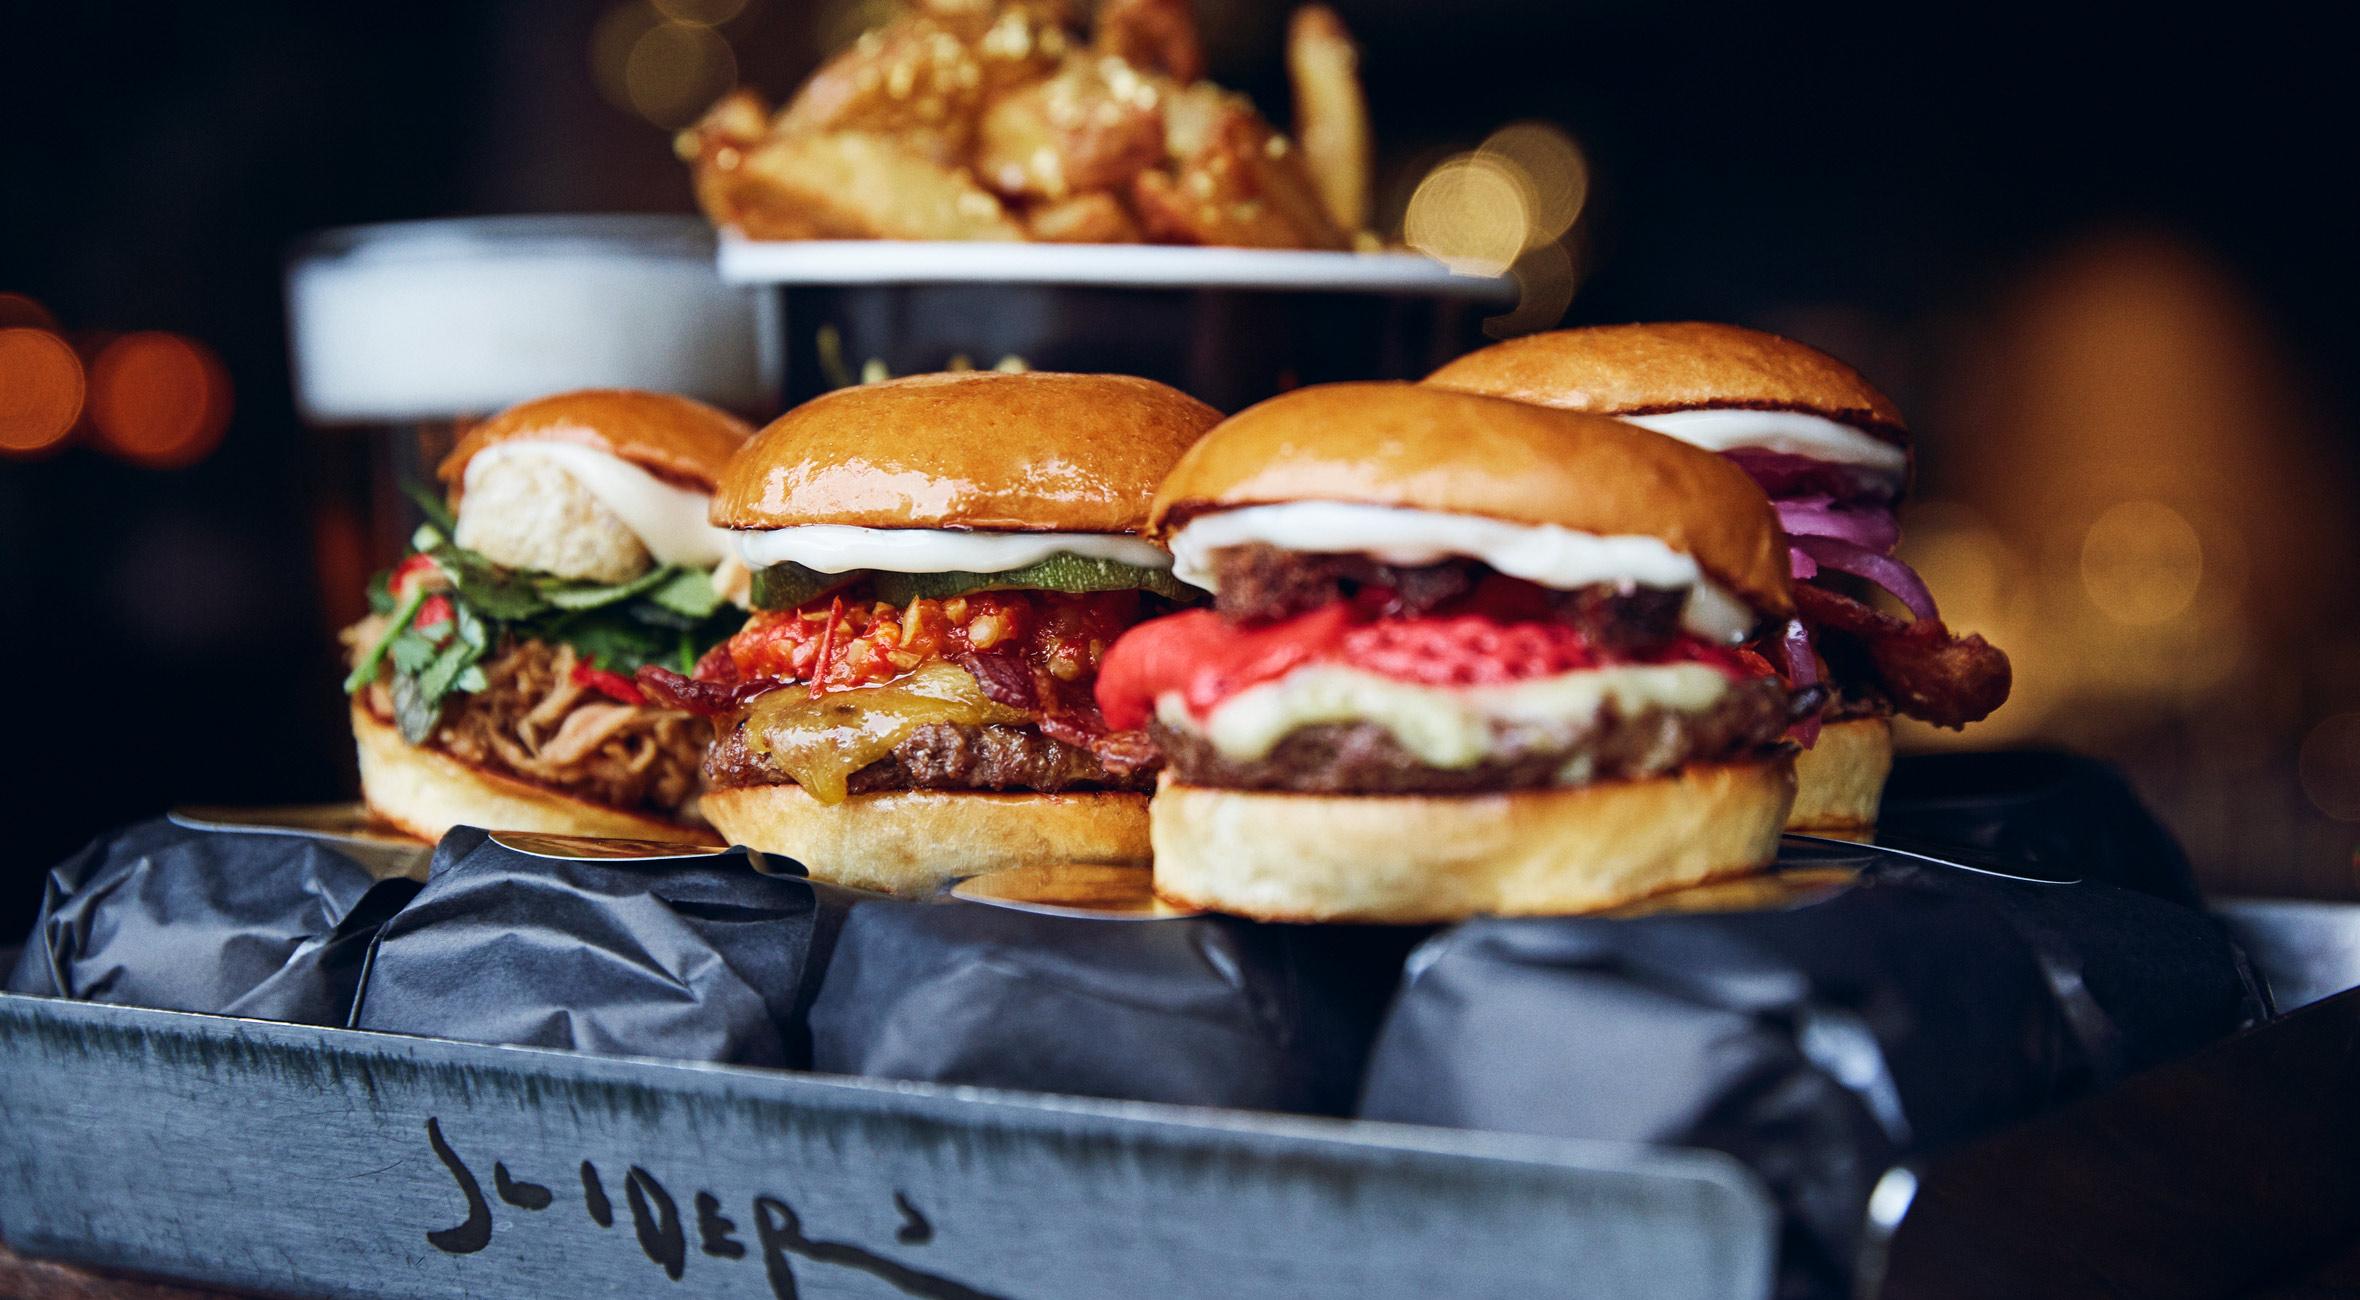 2 burgermenuer hos Sliders på Nørrebro & Vesterbro – Hip fast food restaurant serverer gourmetburgere i miniformat